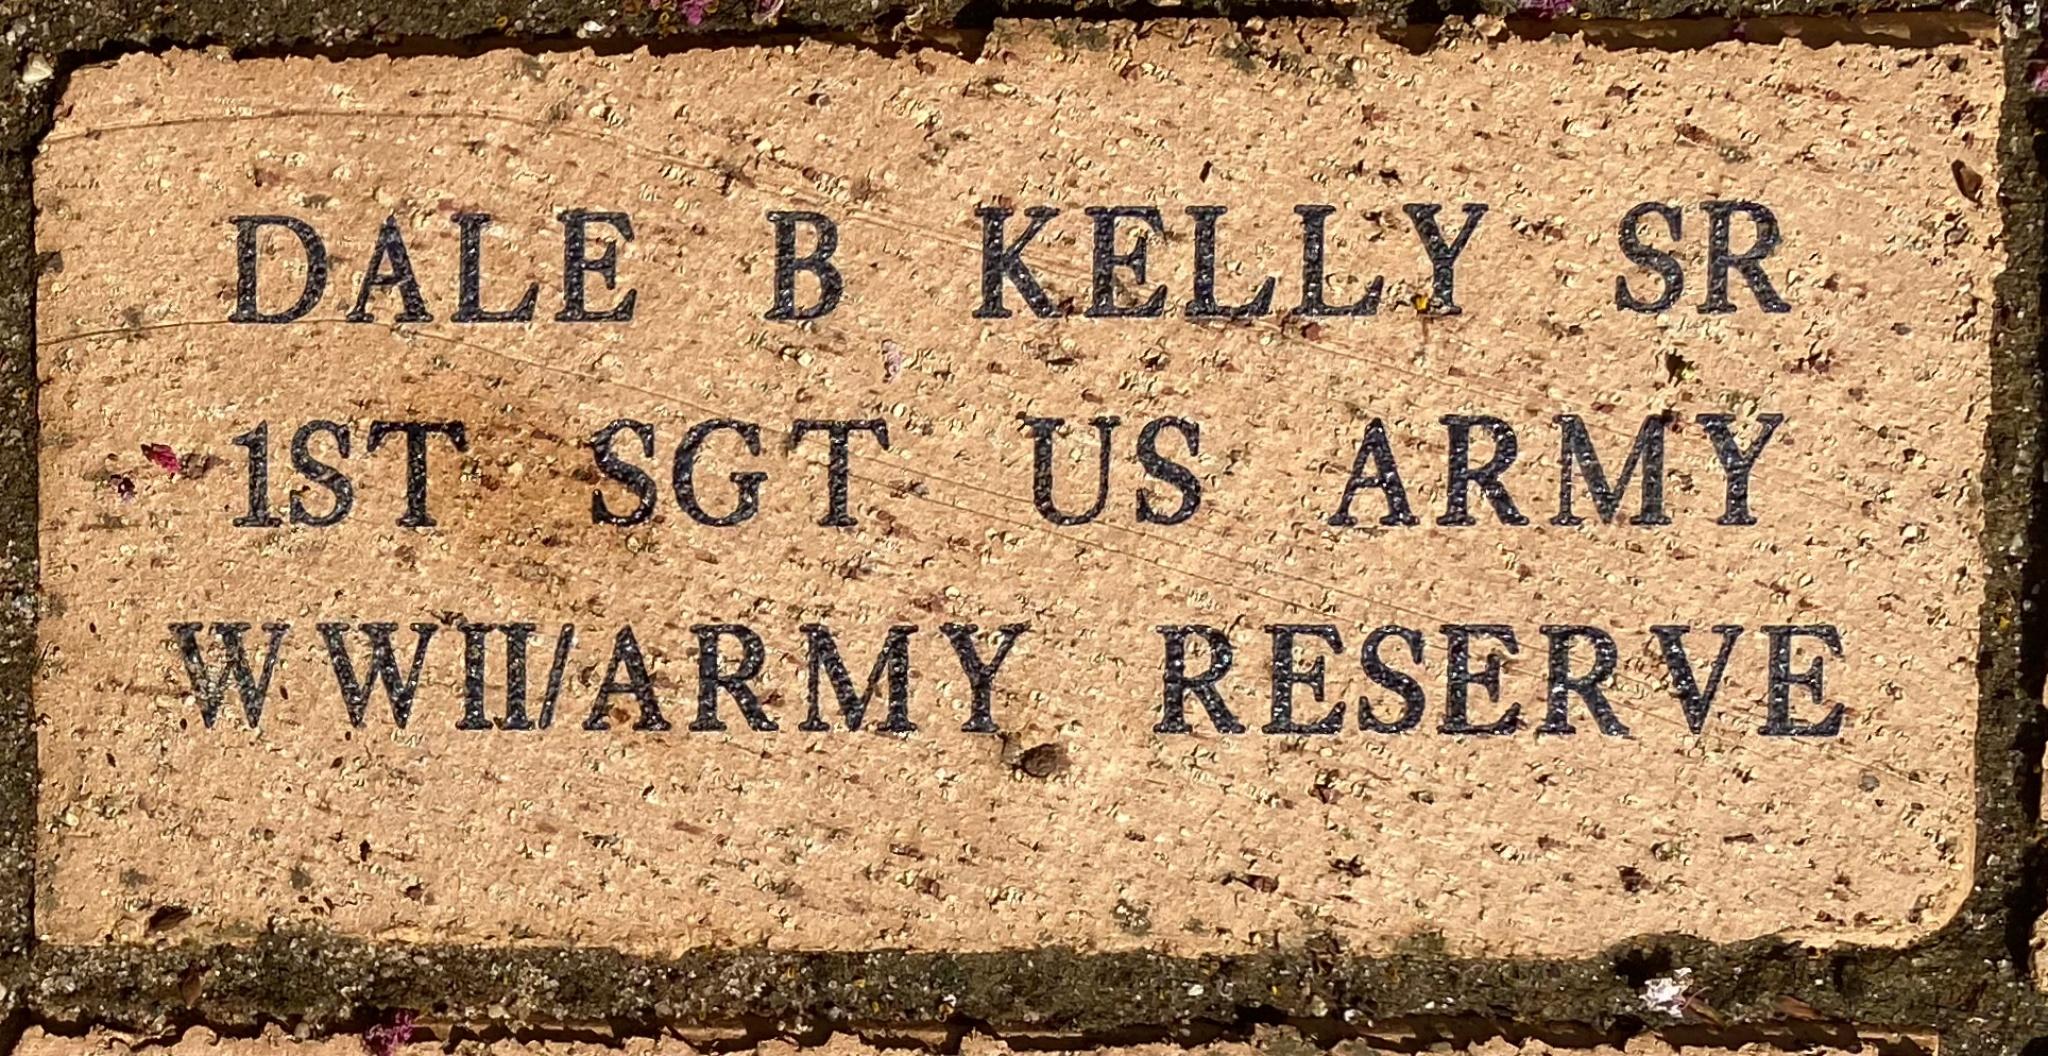 DALE B KELLY SR 1ST SGT US ARMY WWII/ARMY RESERVE